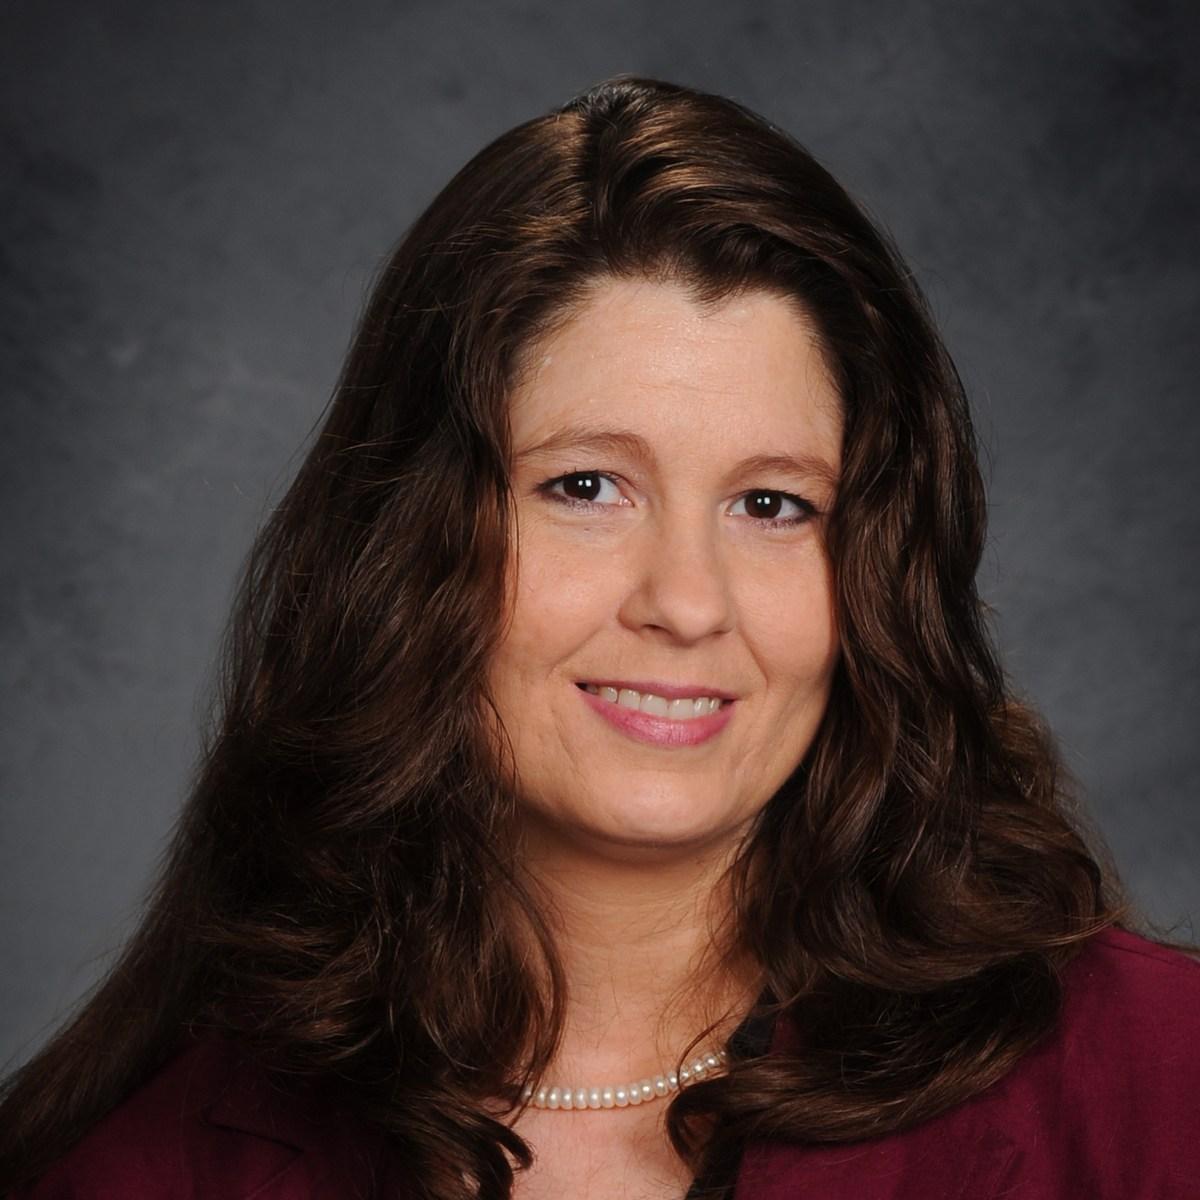 staff directory willis high school lisa coldwell s profile photo